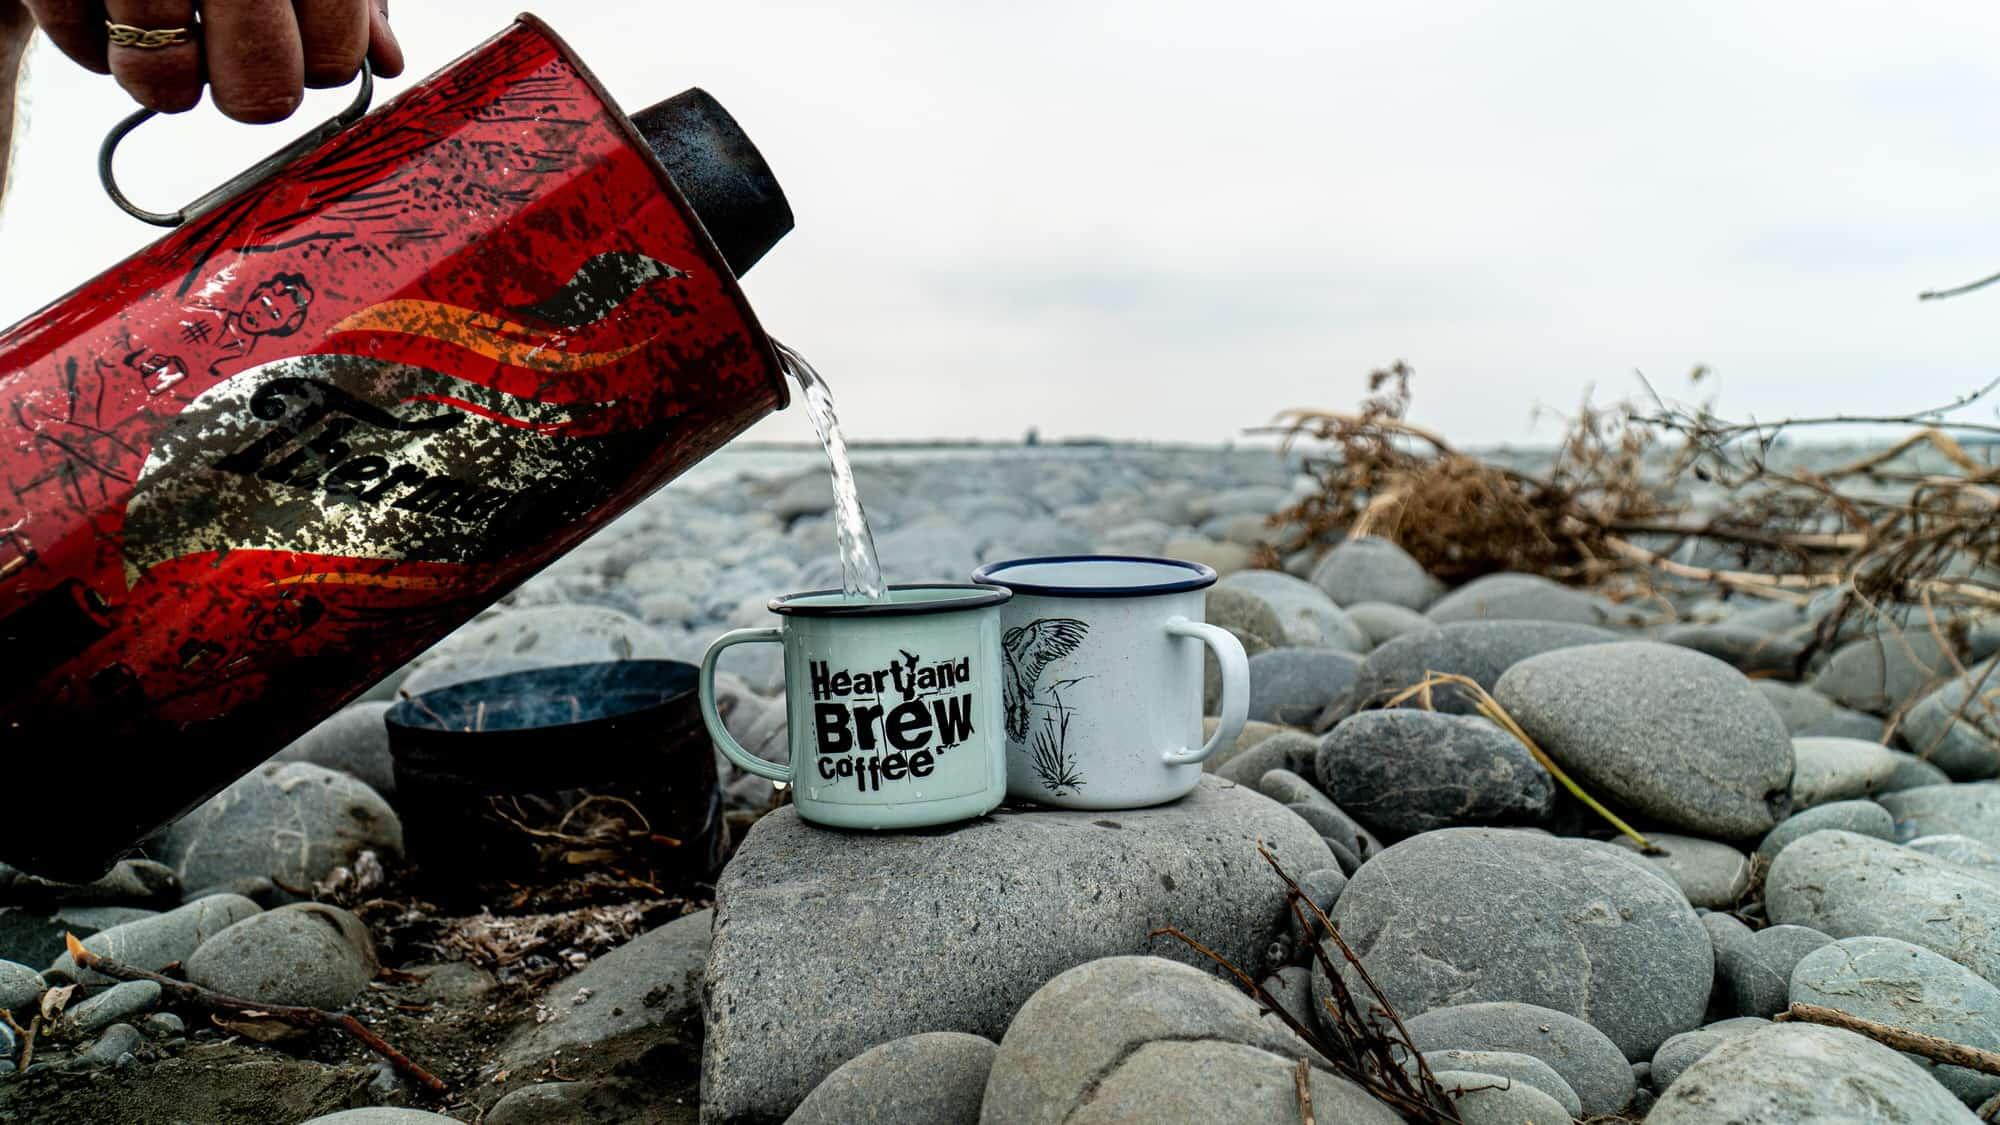 Heartland Brew Coffee in the wild